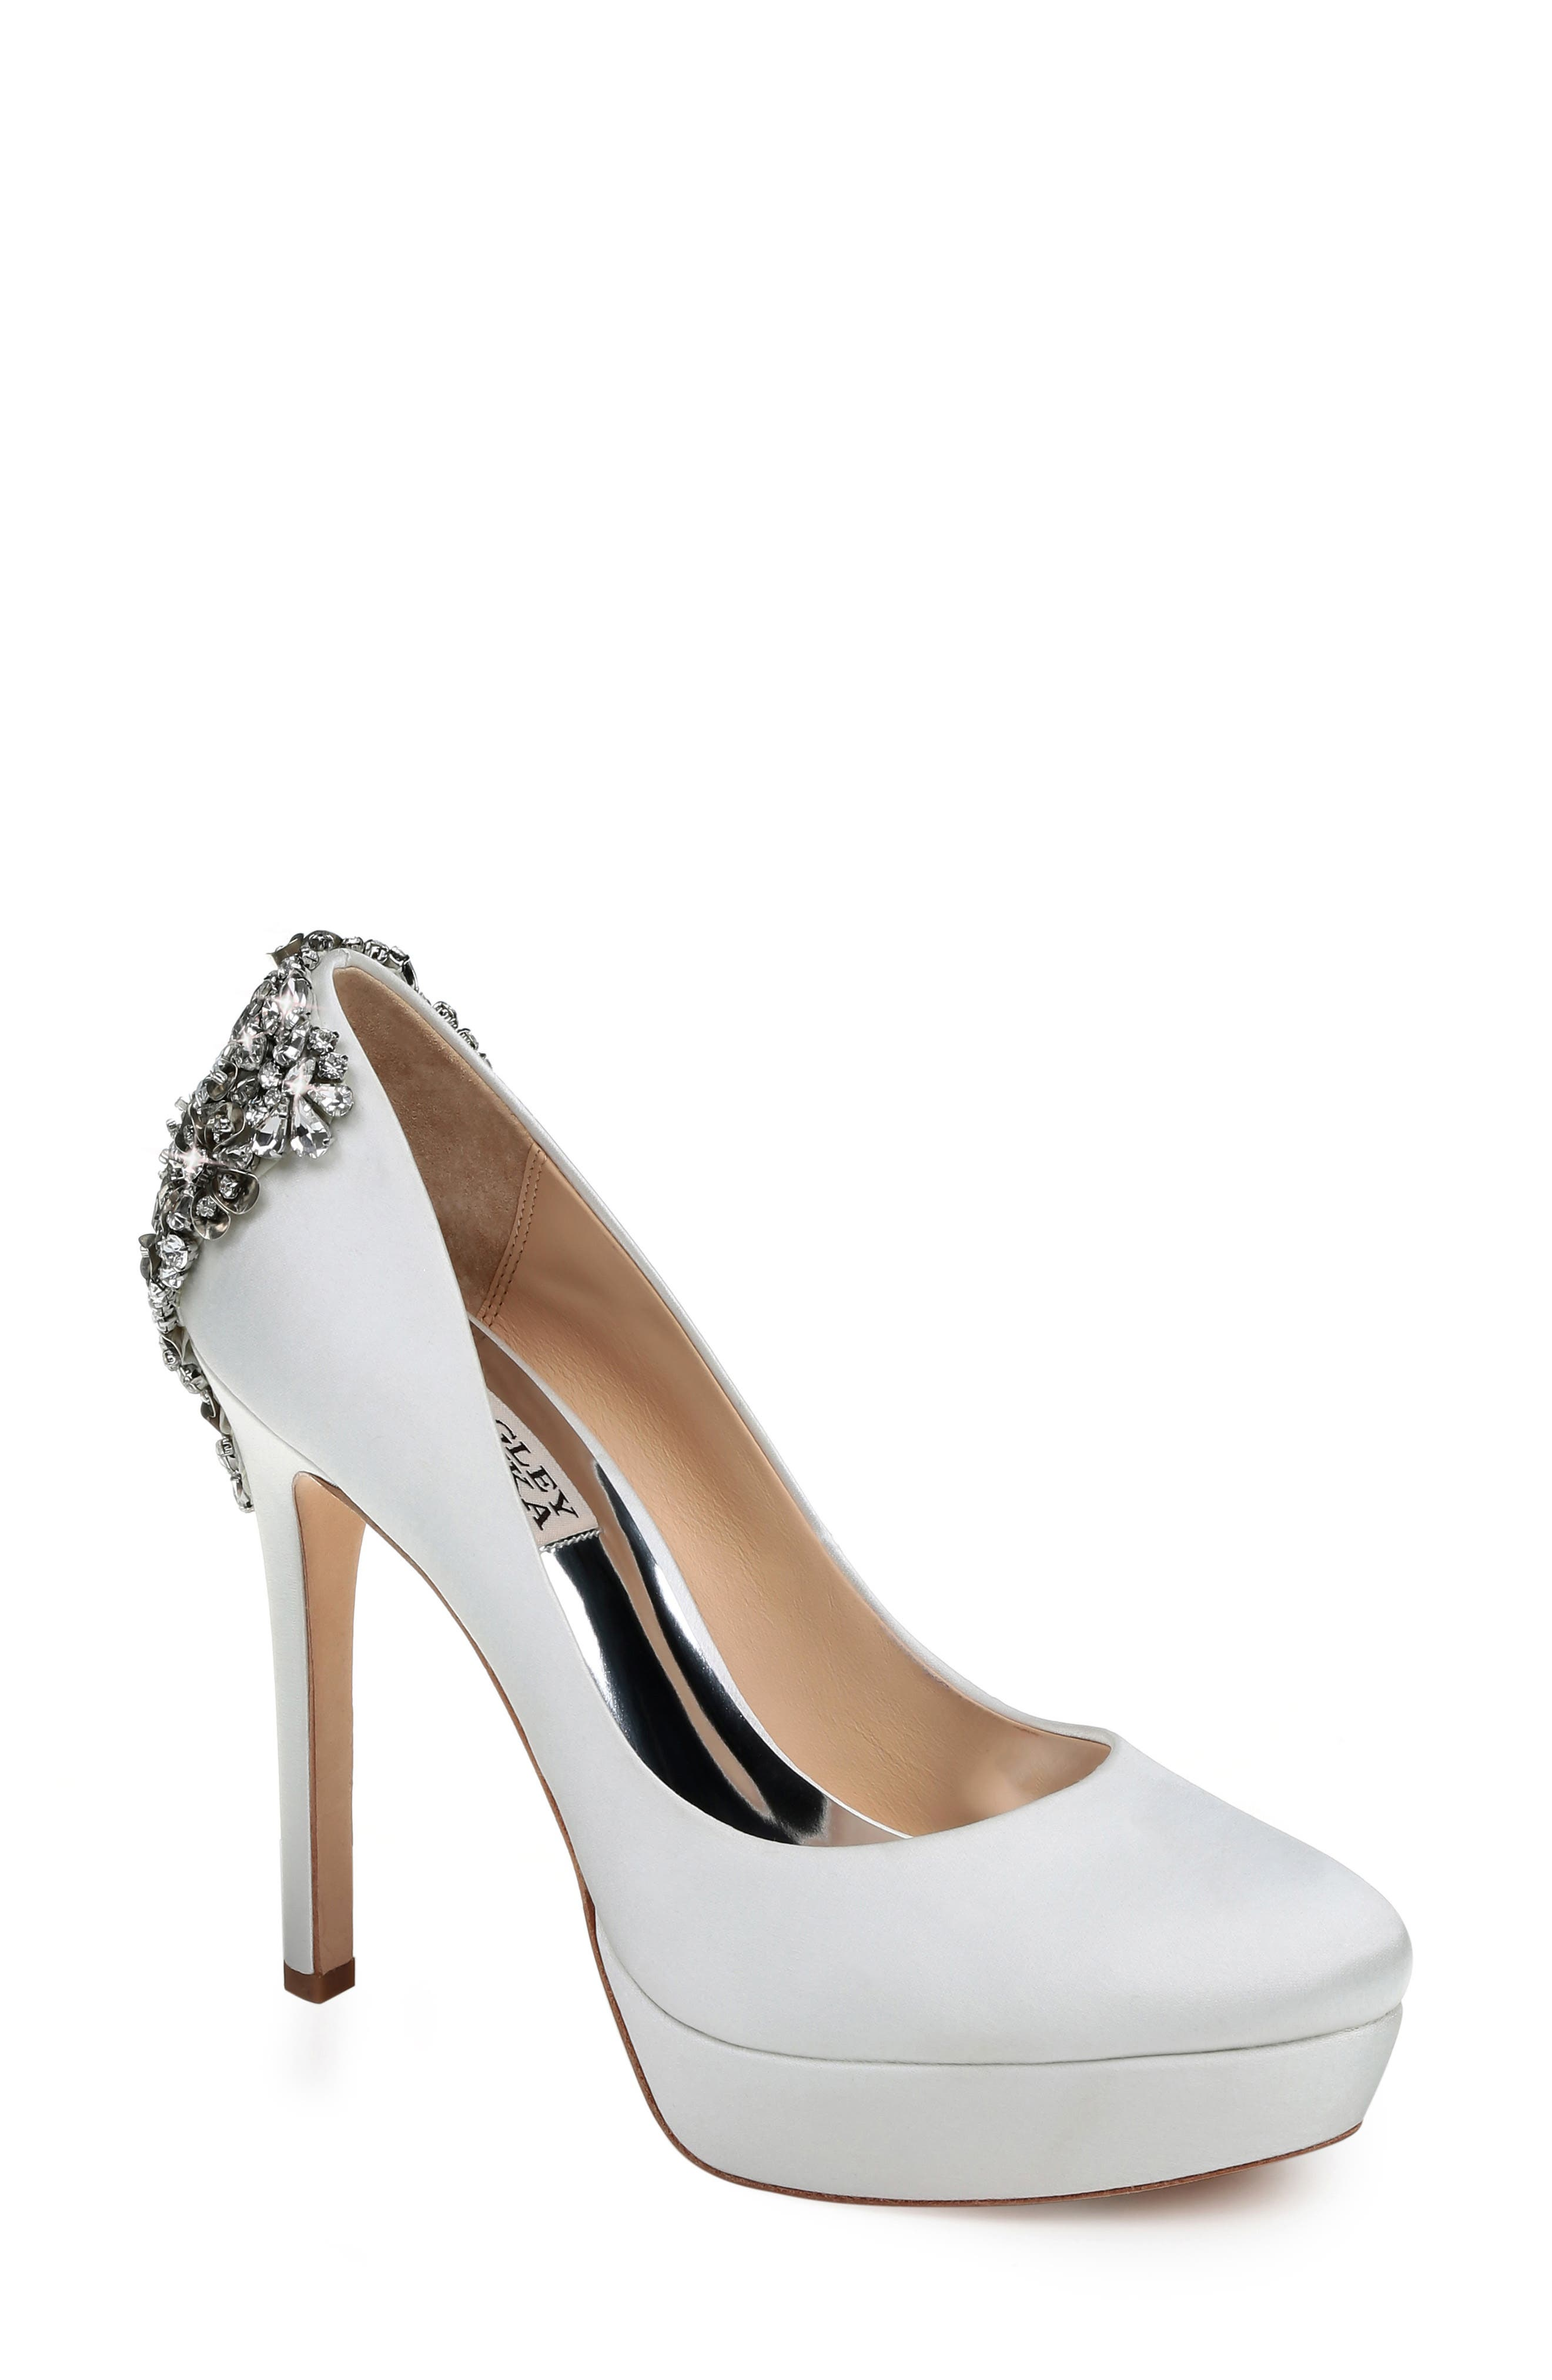 Women'S Viola Almond Toe Embellished Satin Platform High-Heel Pumps in Soft White Satin